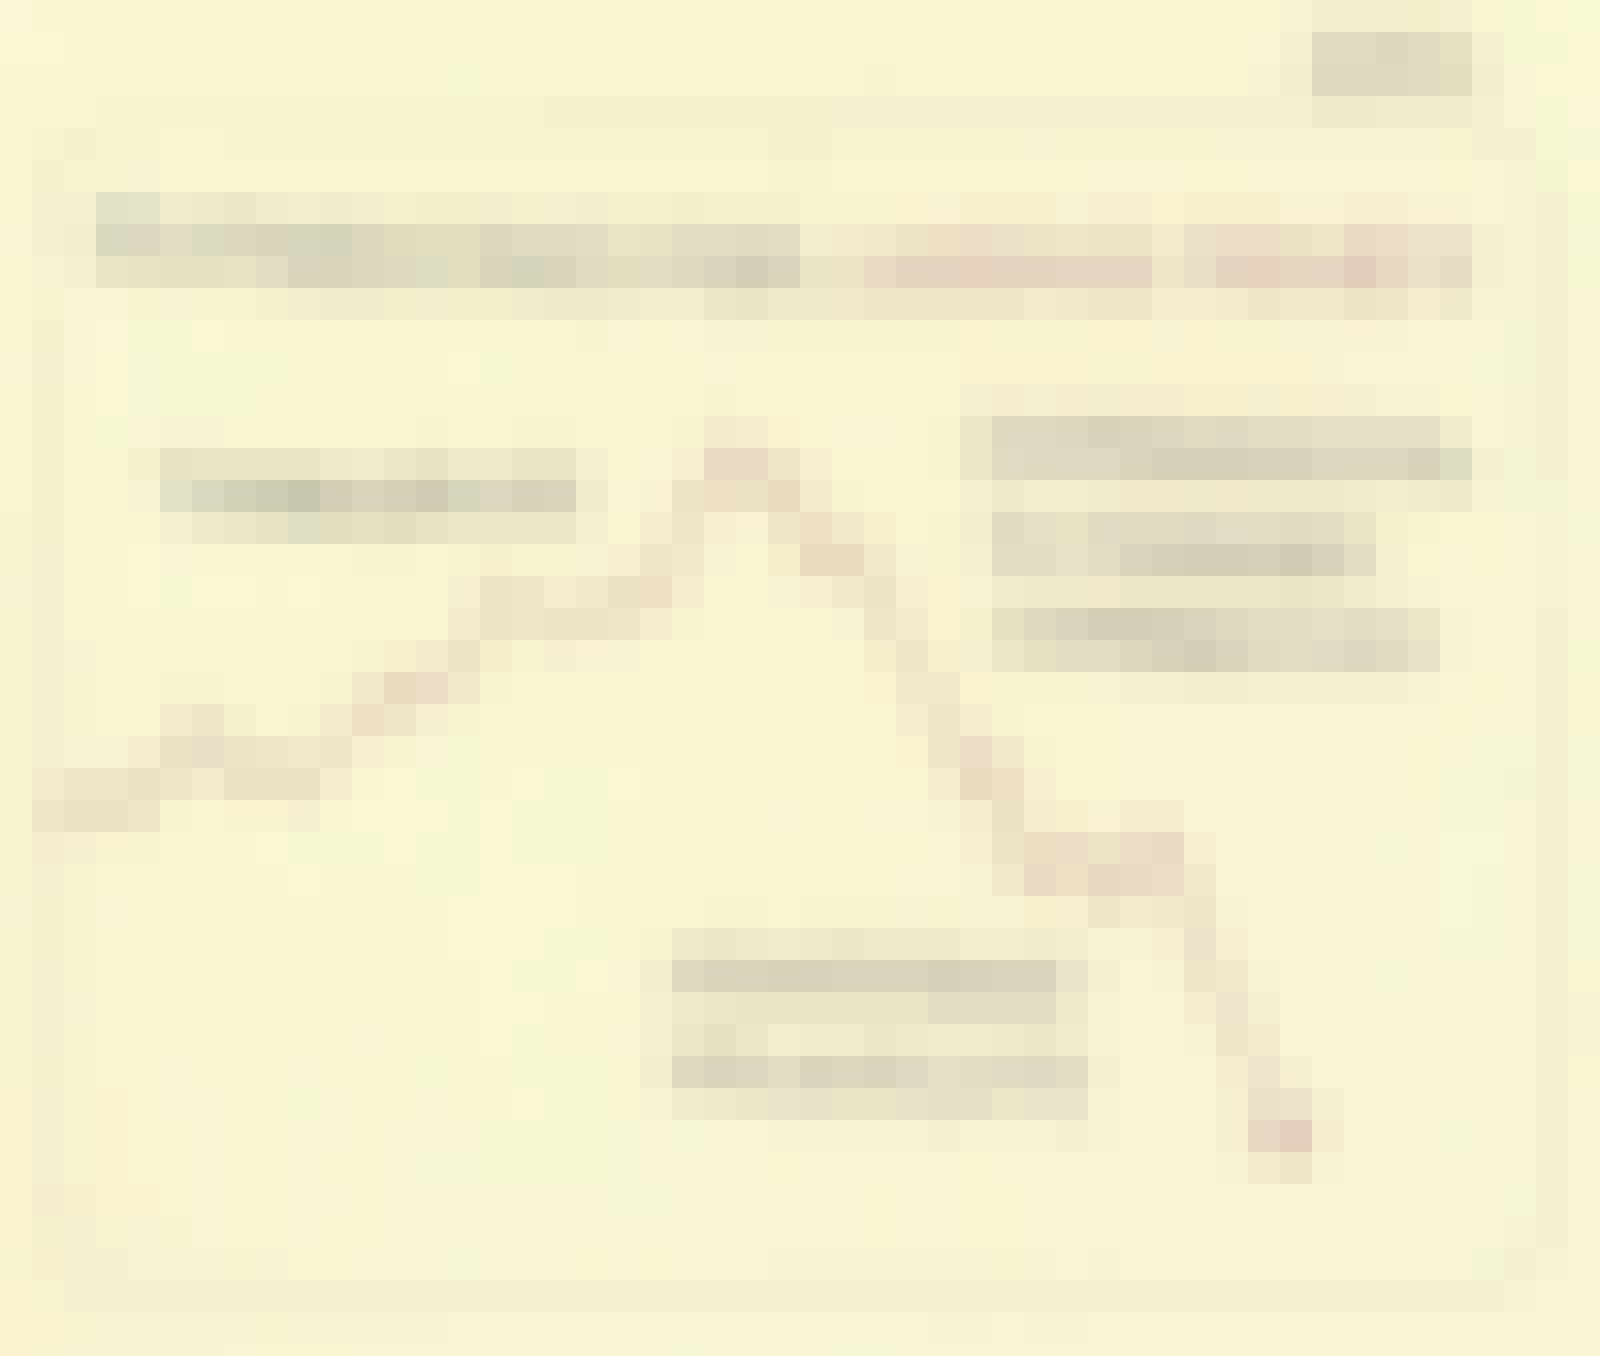 Euphemisms for losing money - Sketchplanations